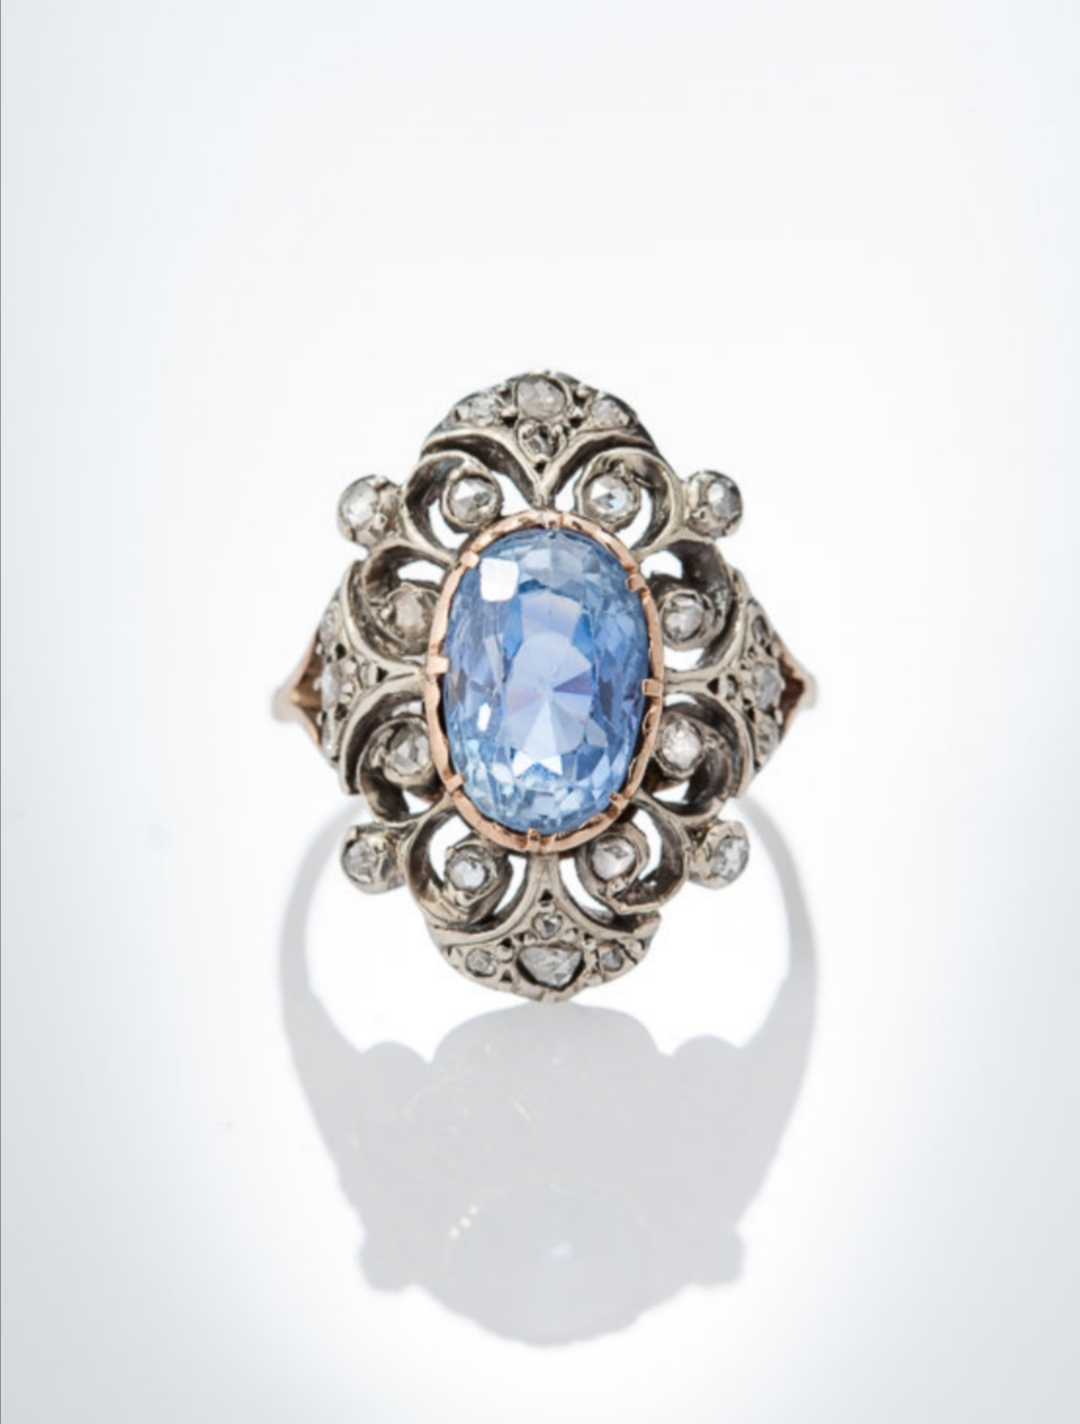 Antique sapphire engagement ring